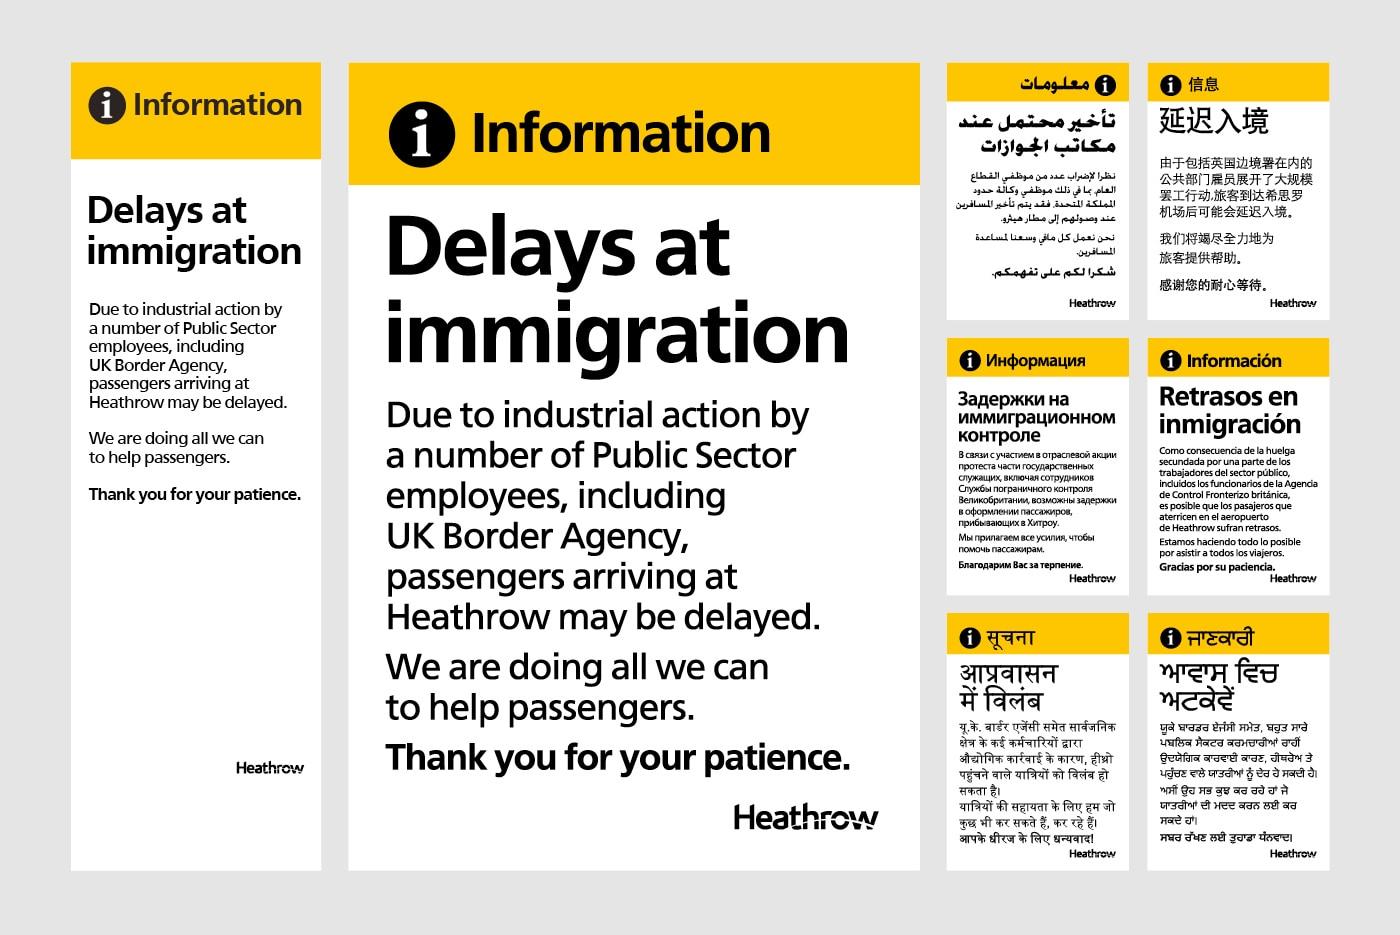 Heathrow Crisis